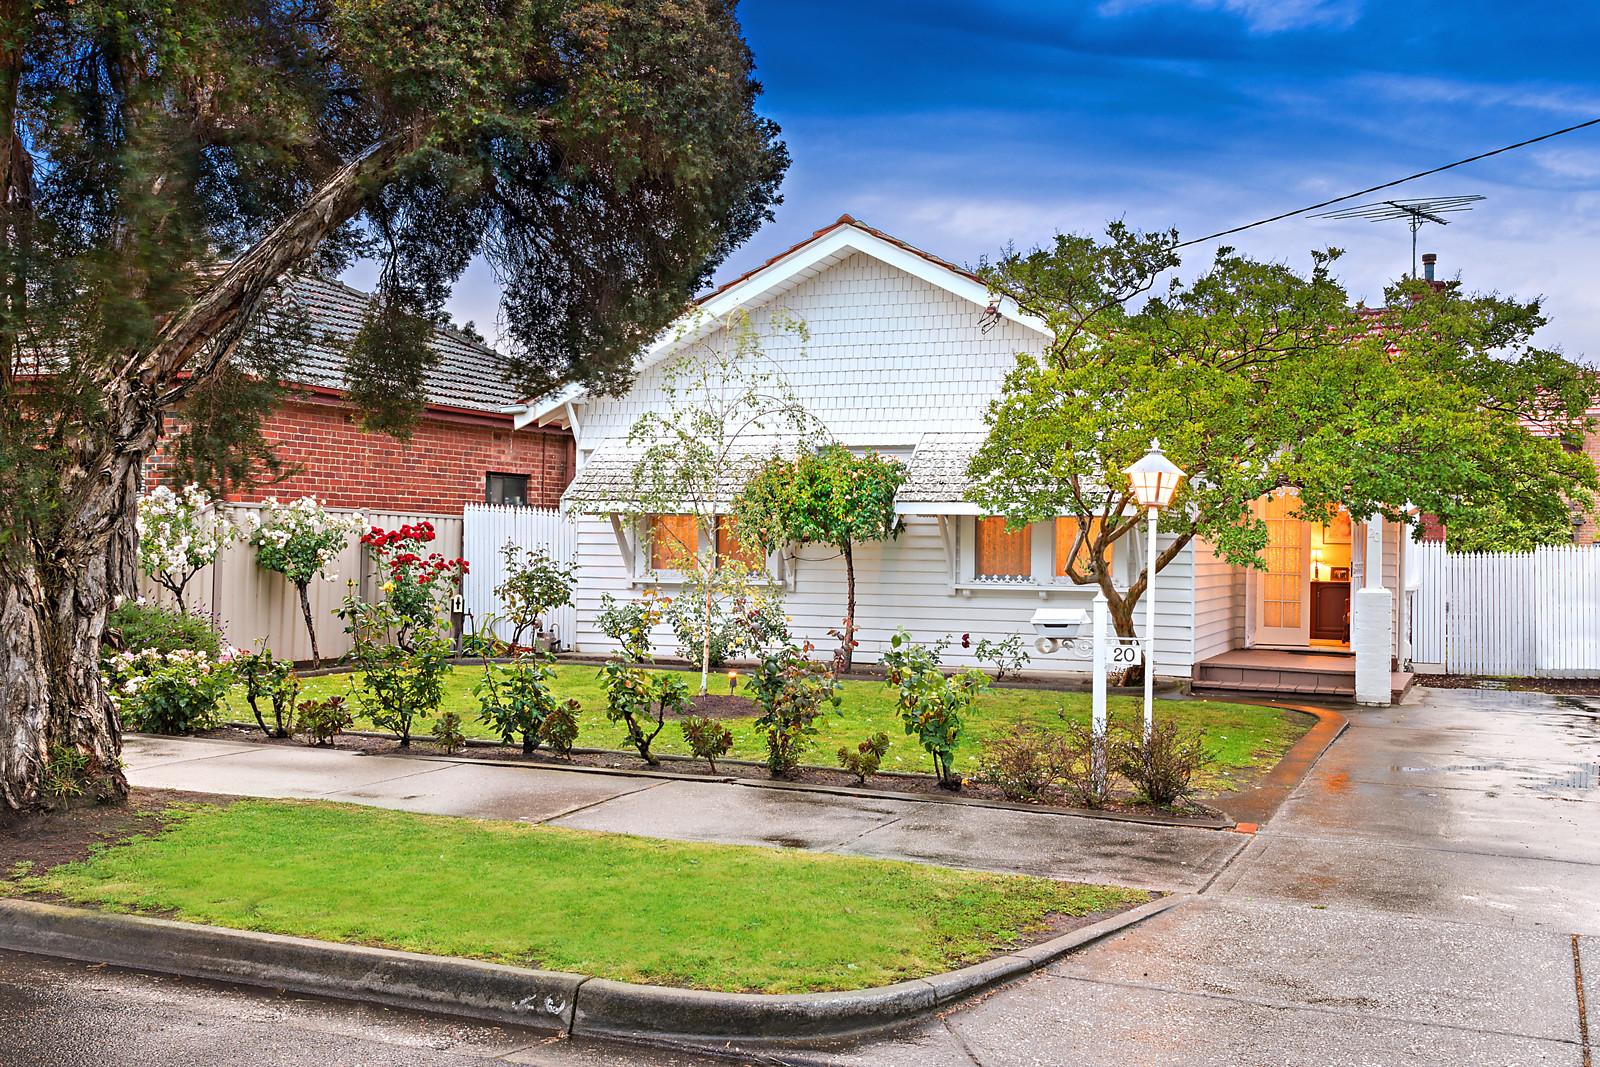 20 clara street preston vic 3072 house for sale for Preston house